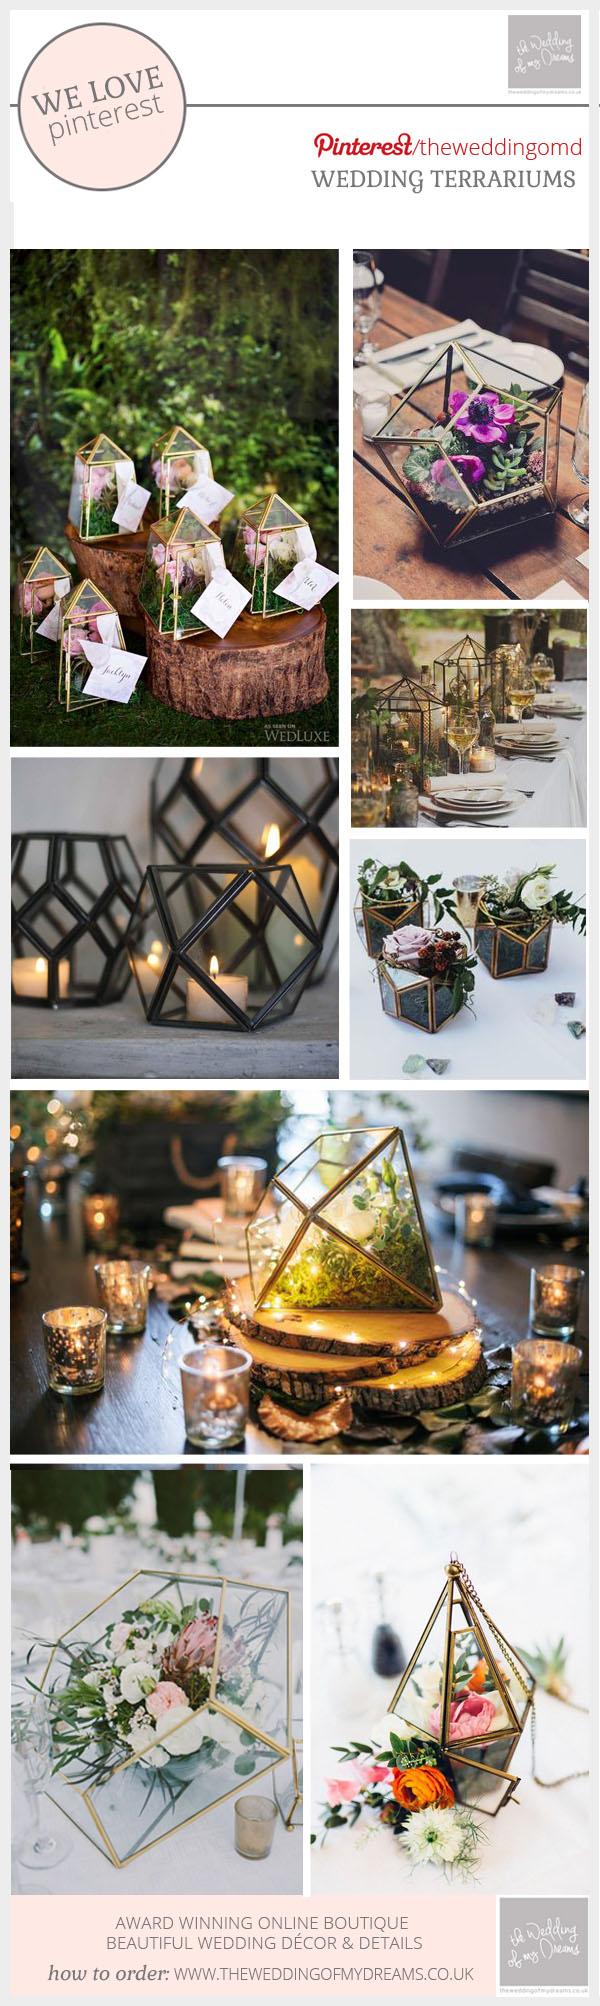 terrariums at weddings